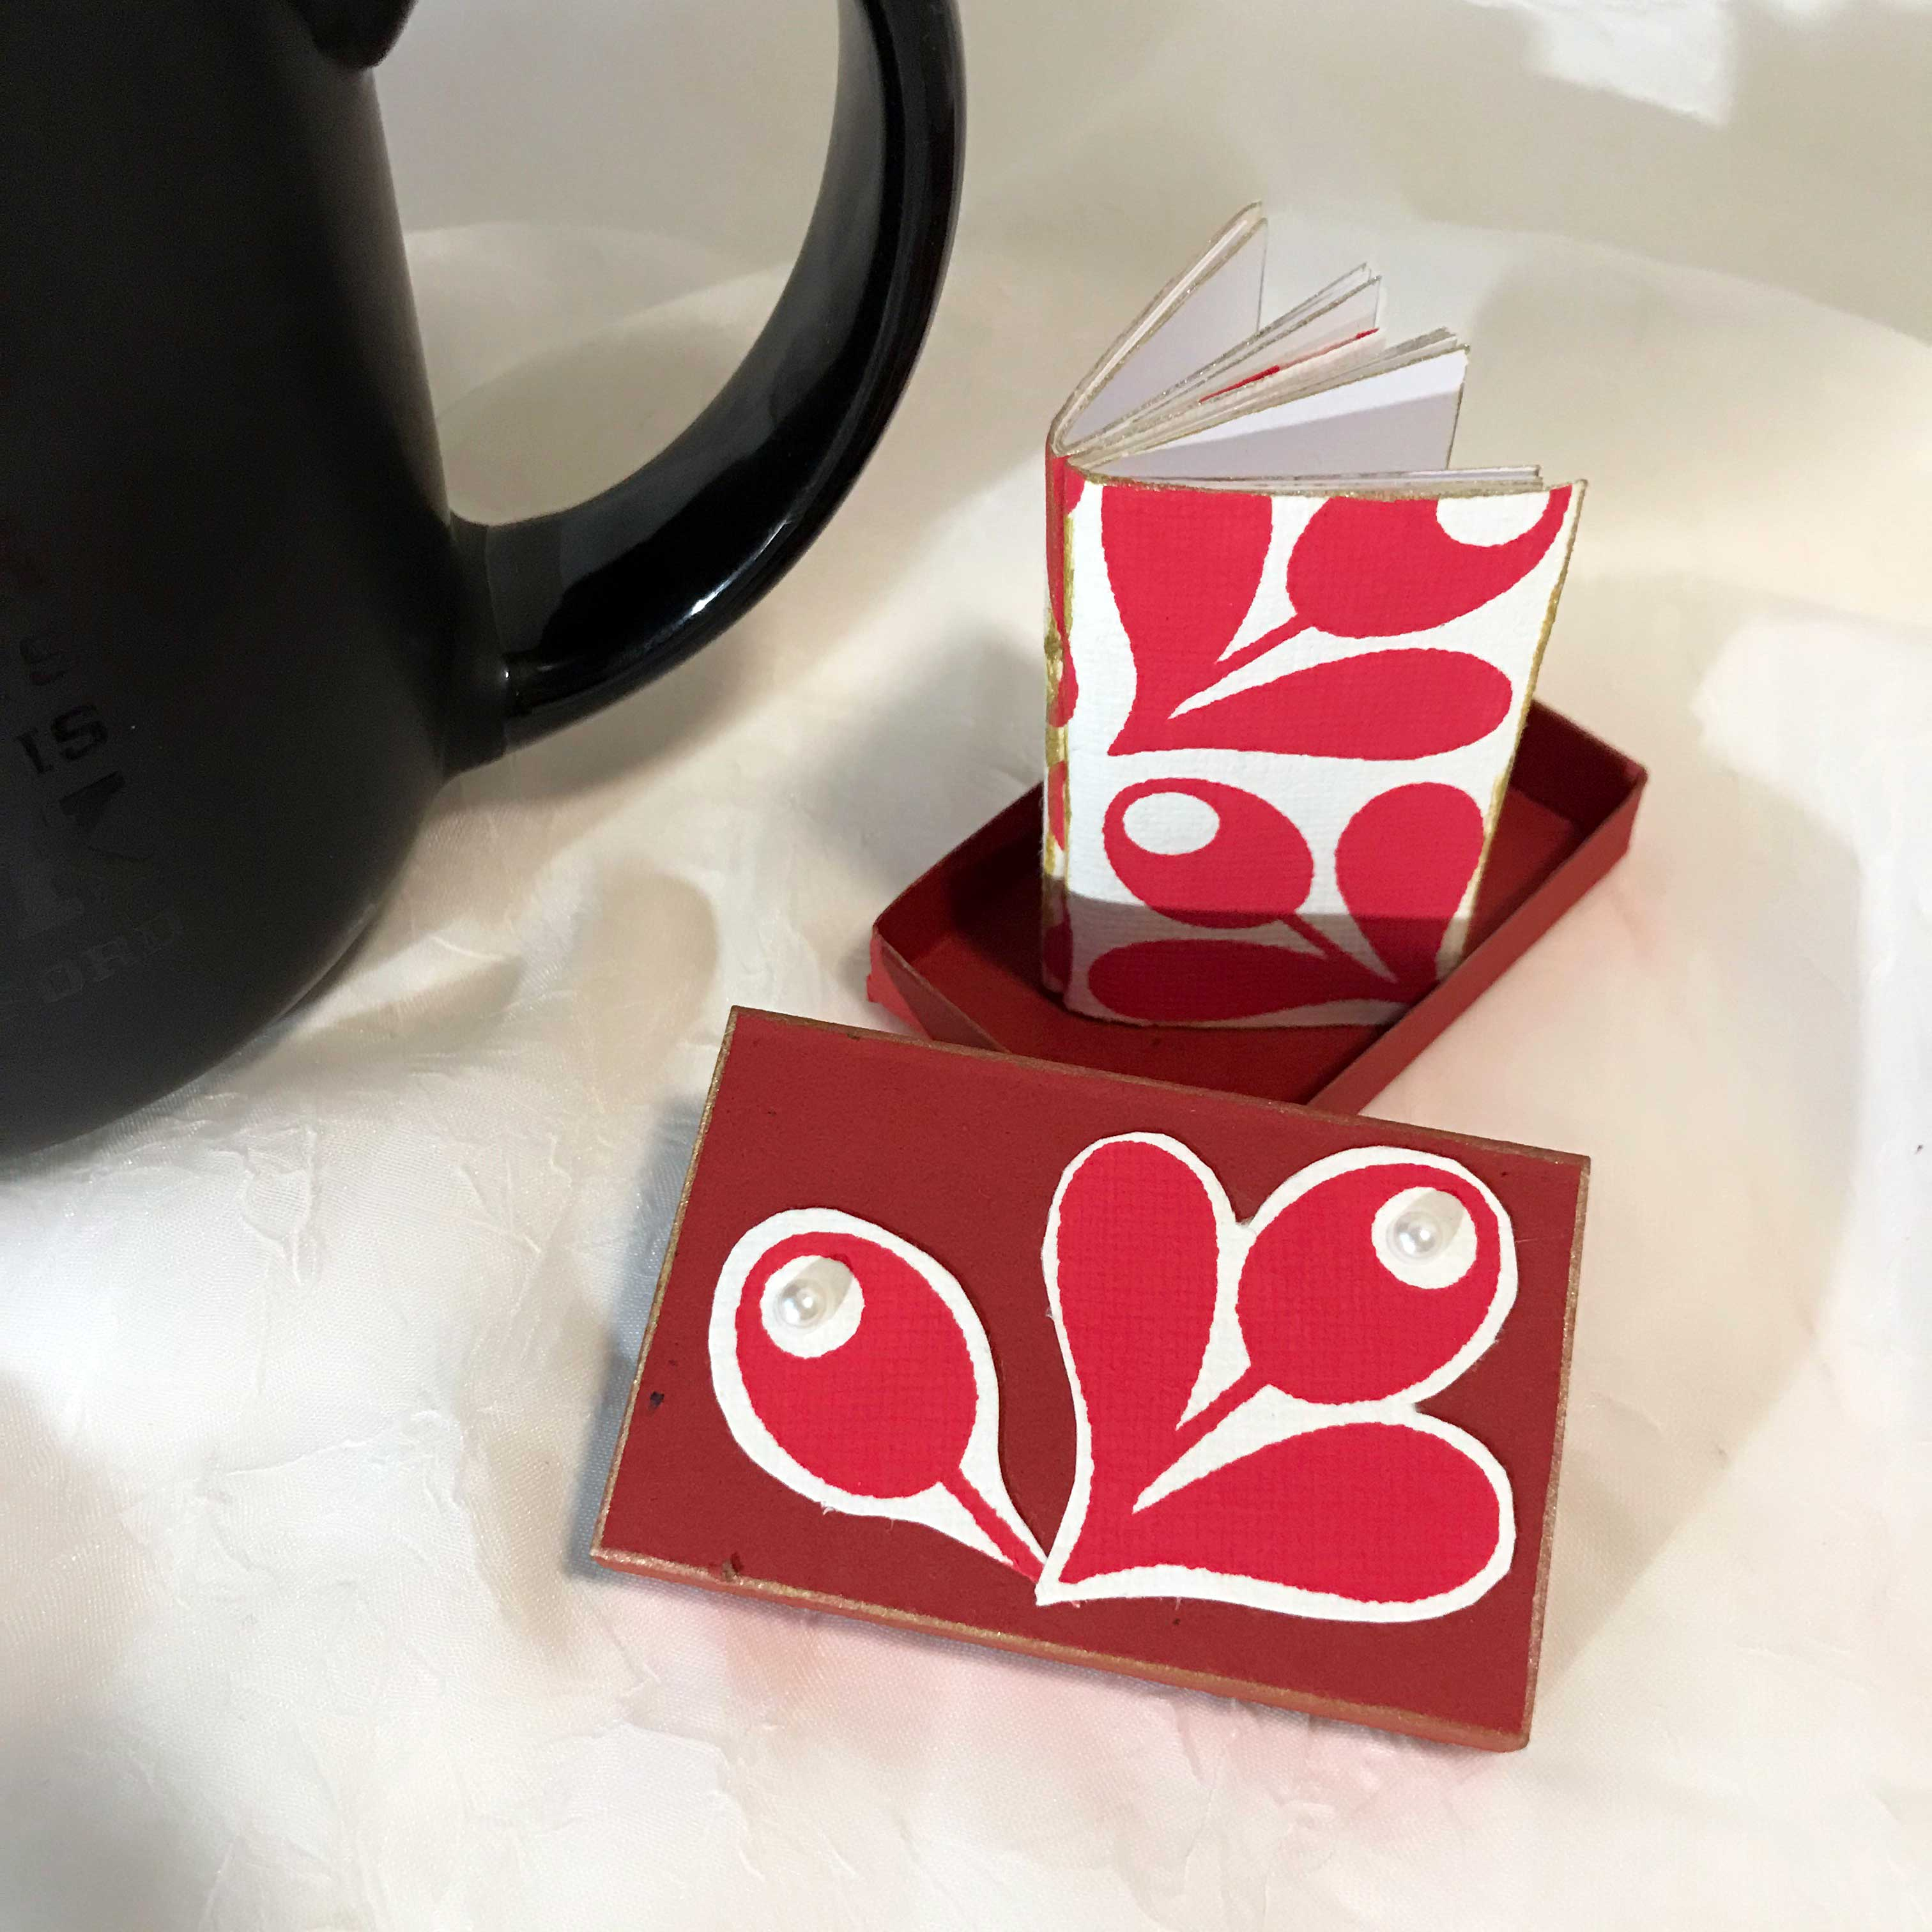 Red Matchbox with mini book inside. alt=